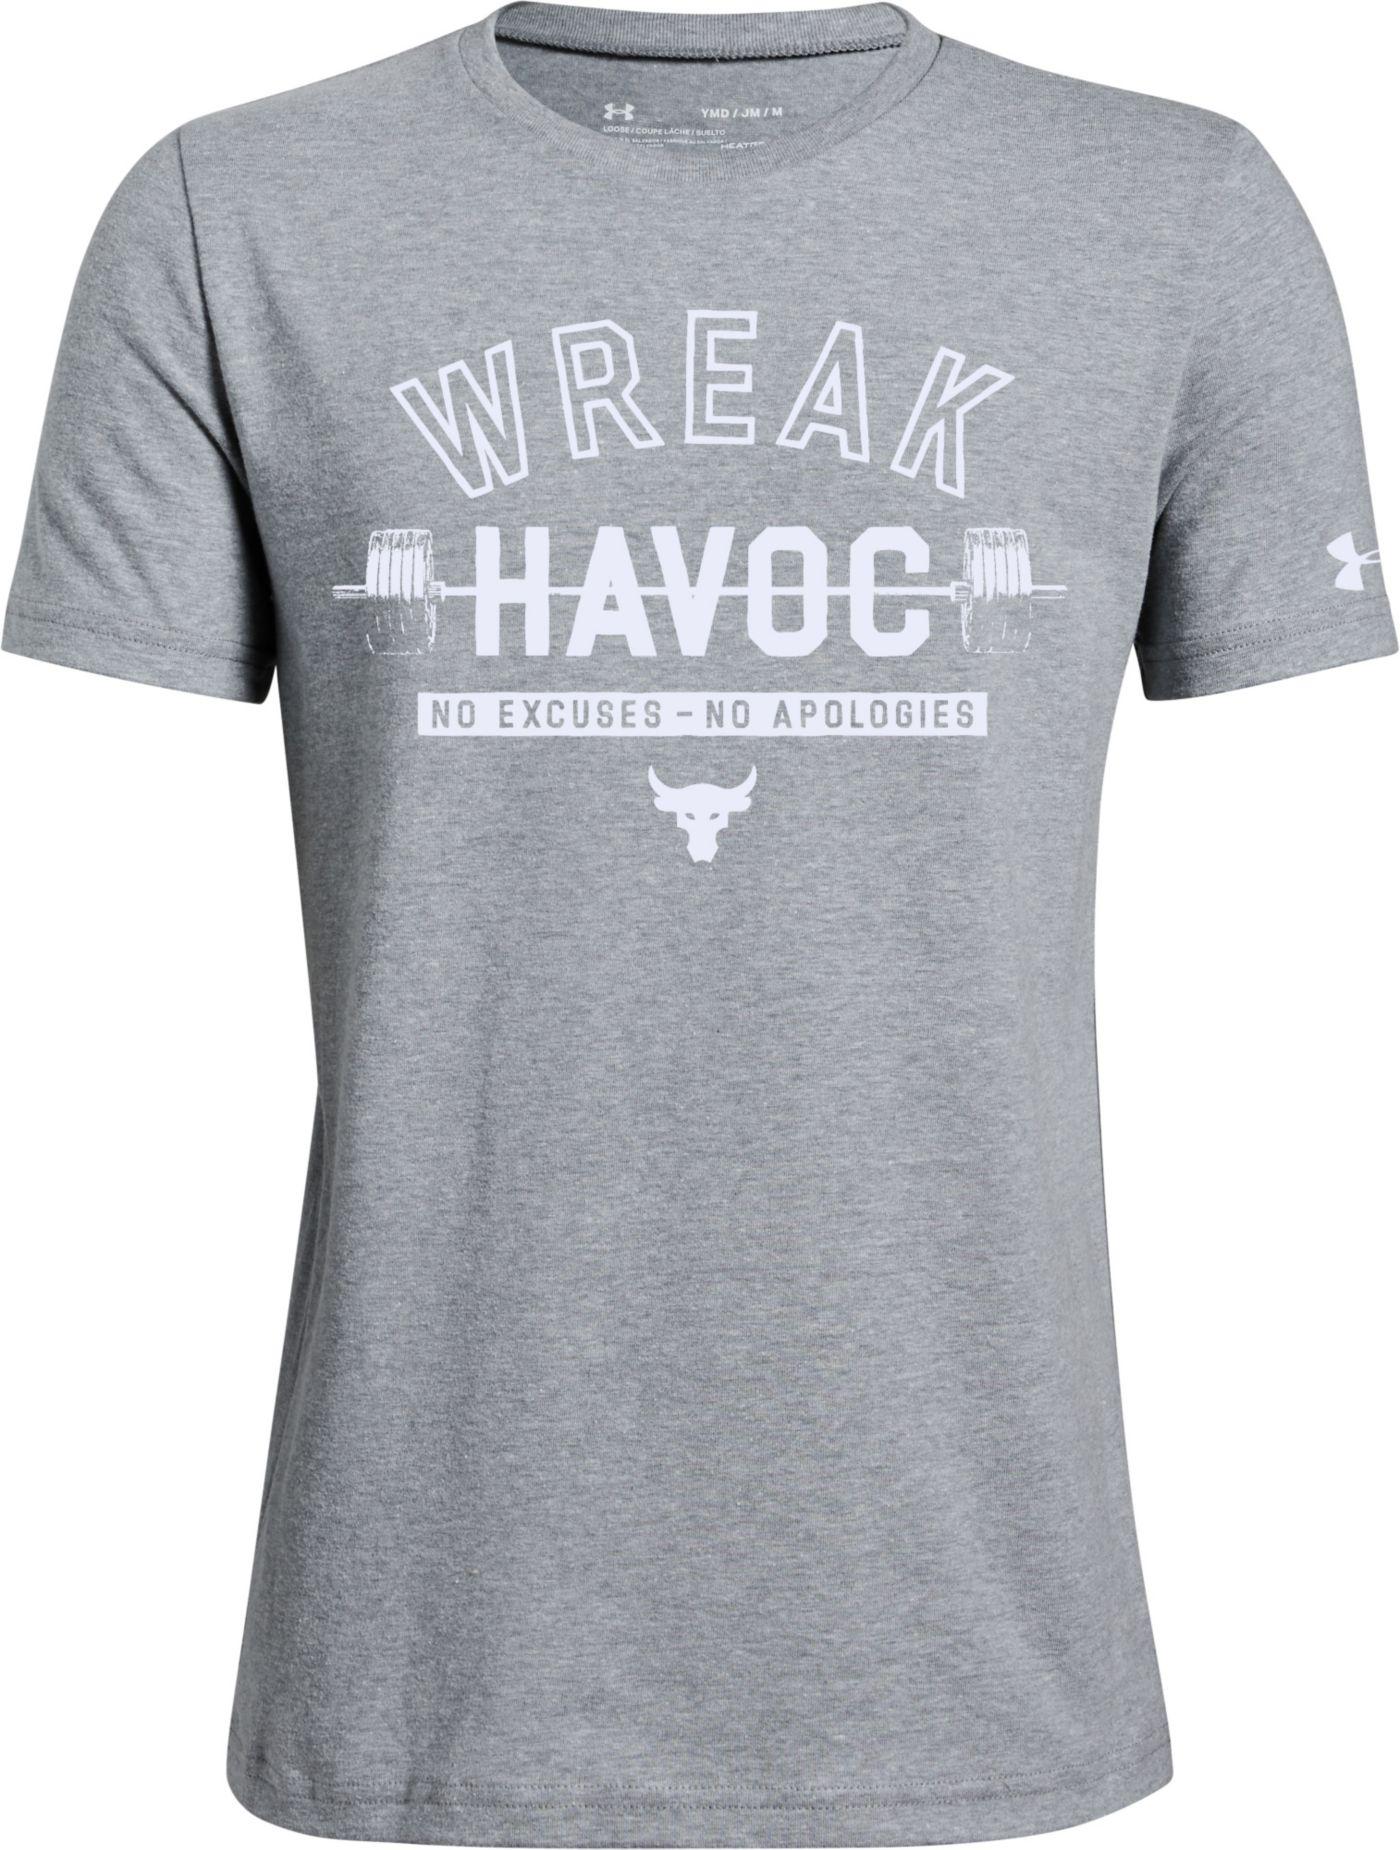 Under Armour Boys' Project Rock Wreak Havoc Graphic T-Shirt